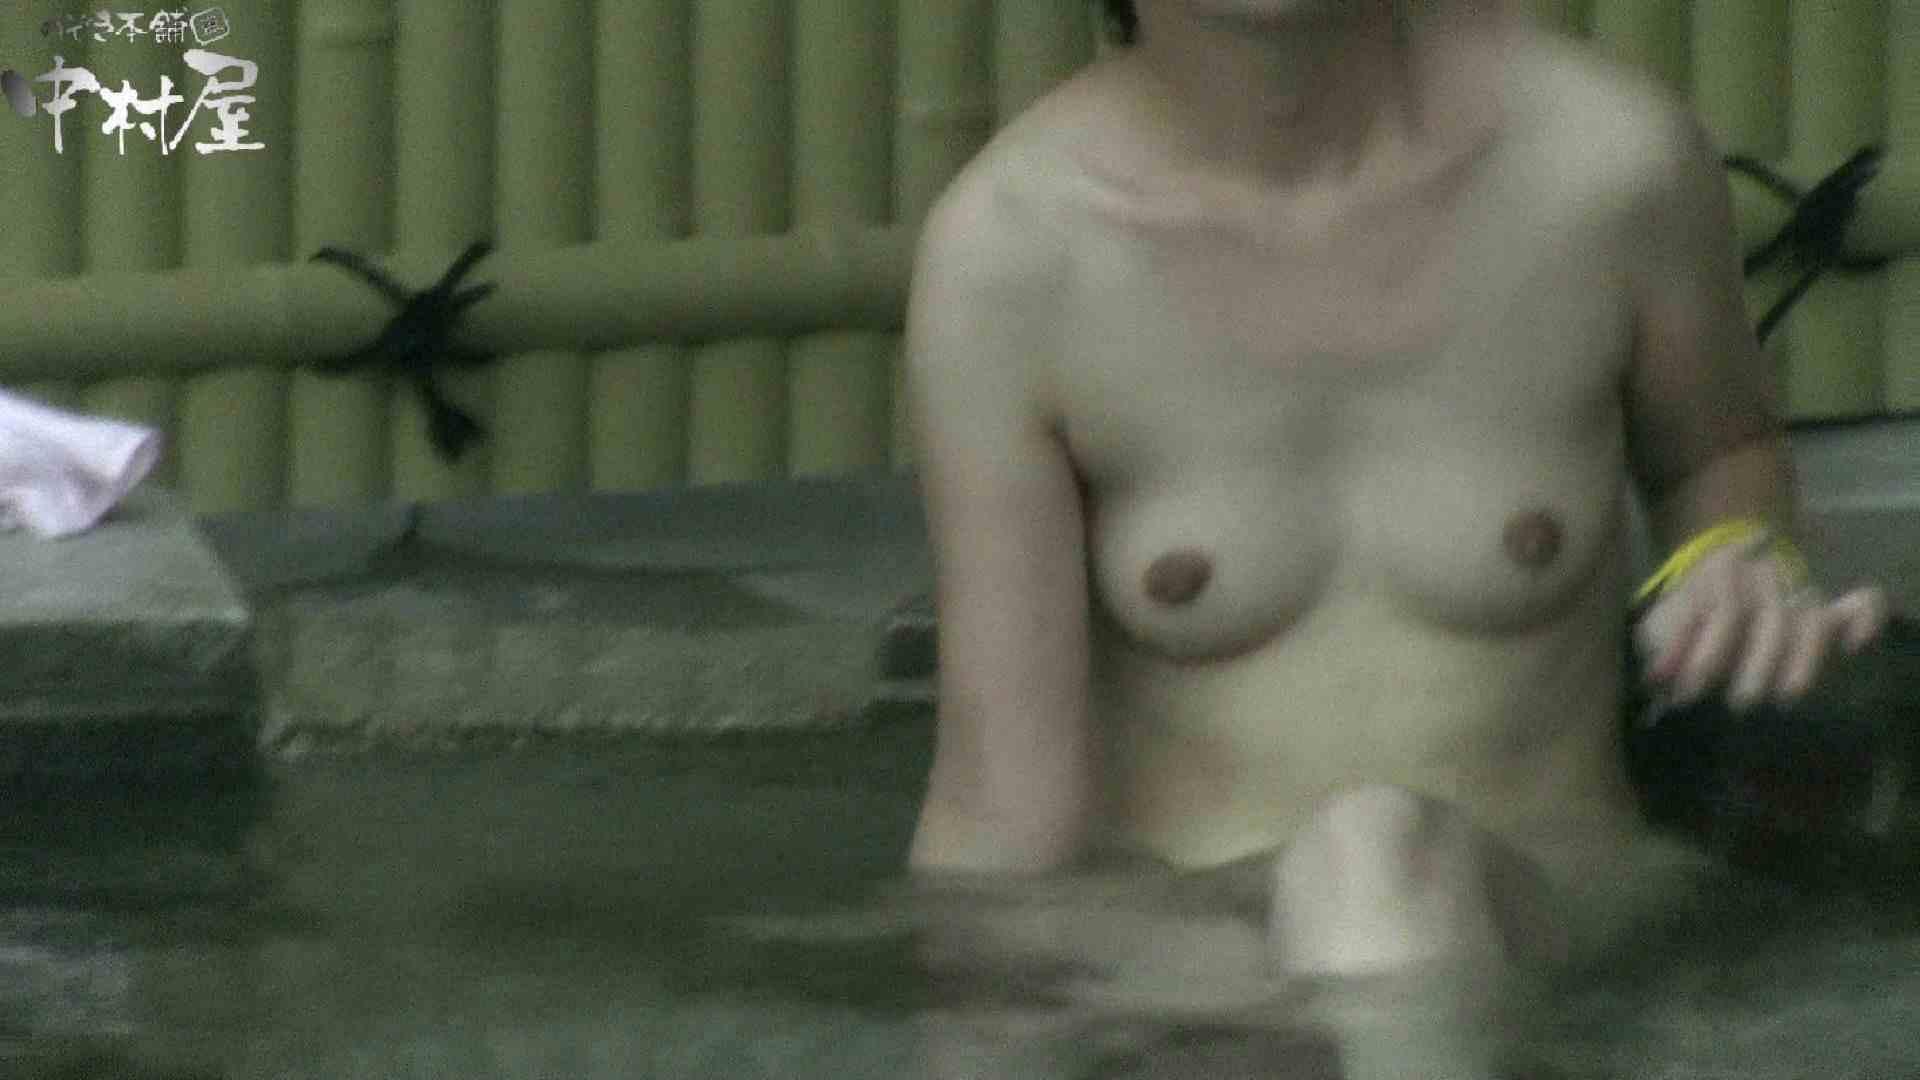 Aquaな露天風呂Vol.904 盗撮師作品 | 露天風呂突入  103pic 10